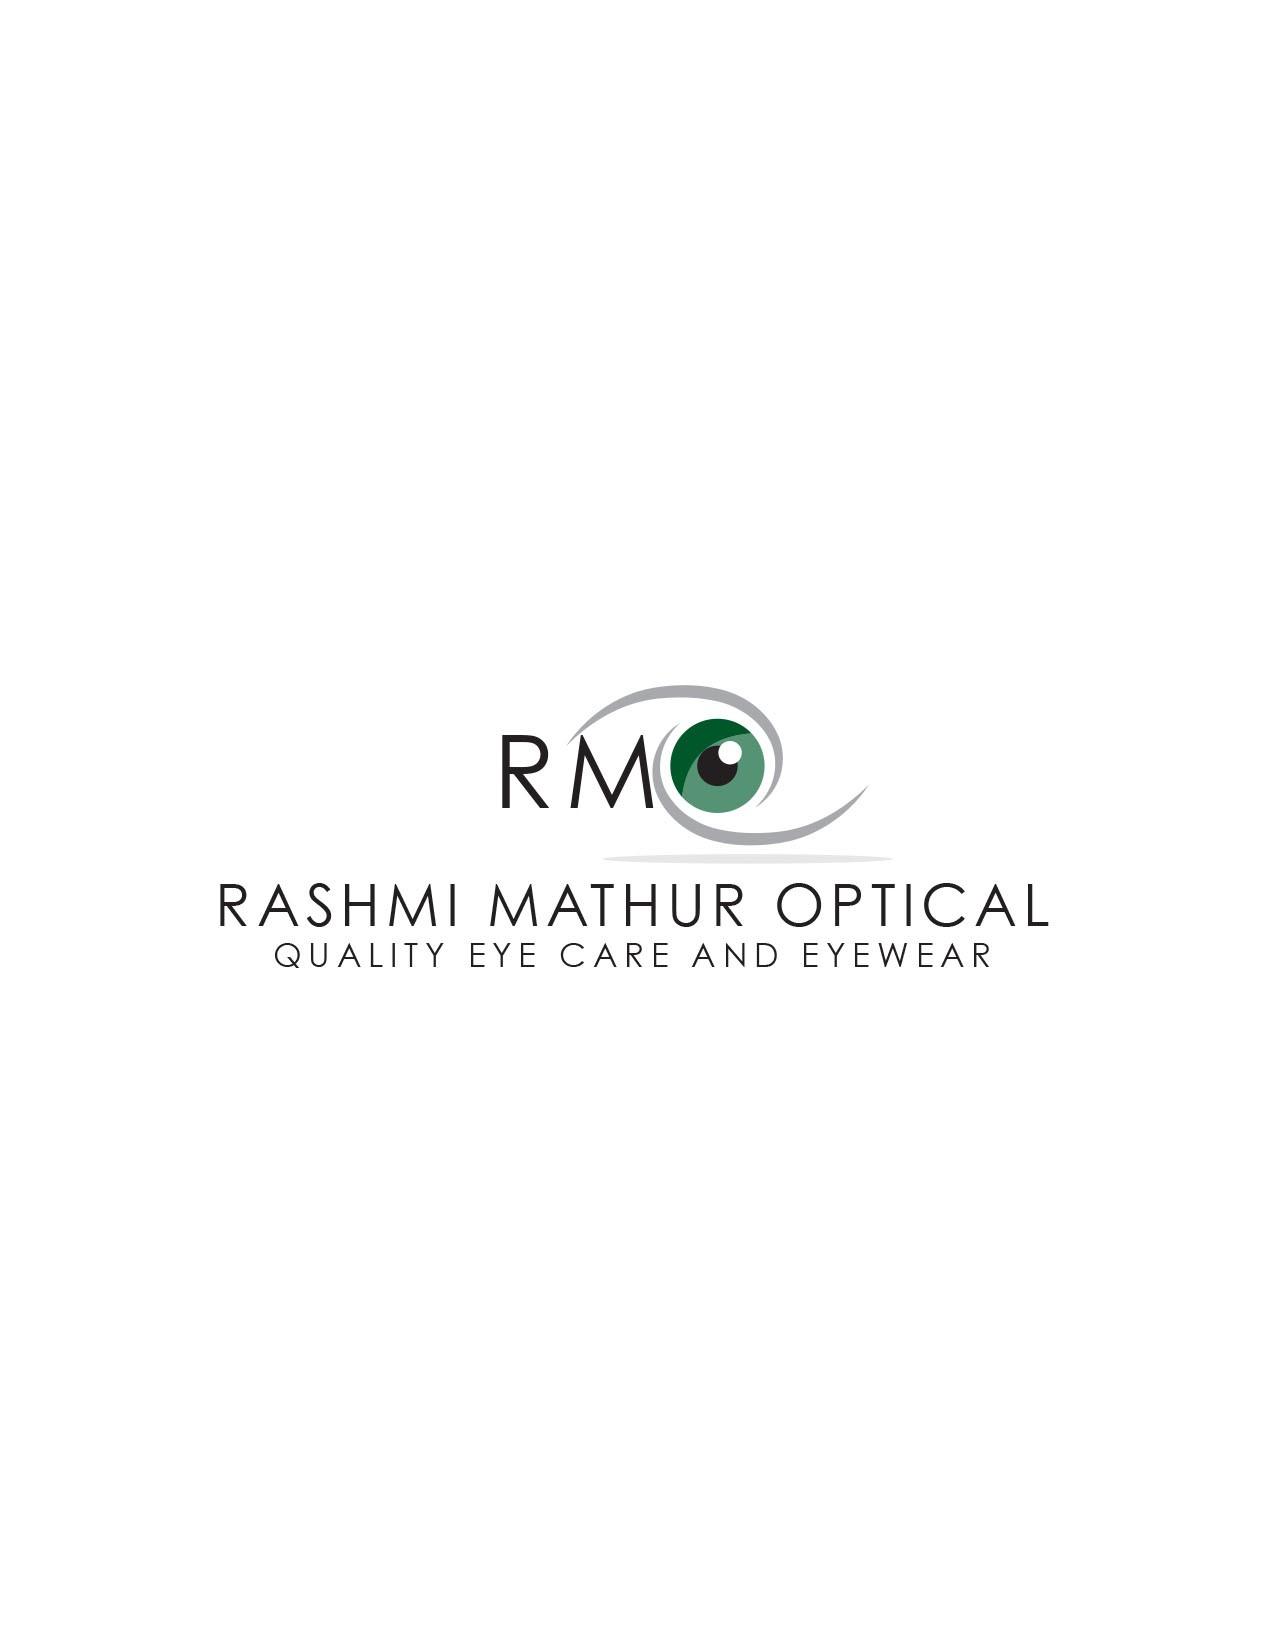 New logo wanted for ONE NAME - Rashmi  Mathur Optical + INITIALS - RMO